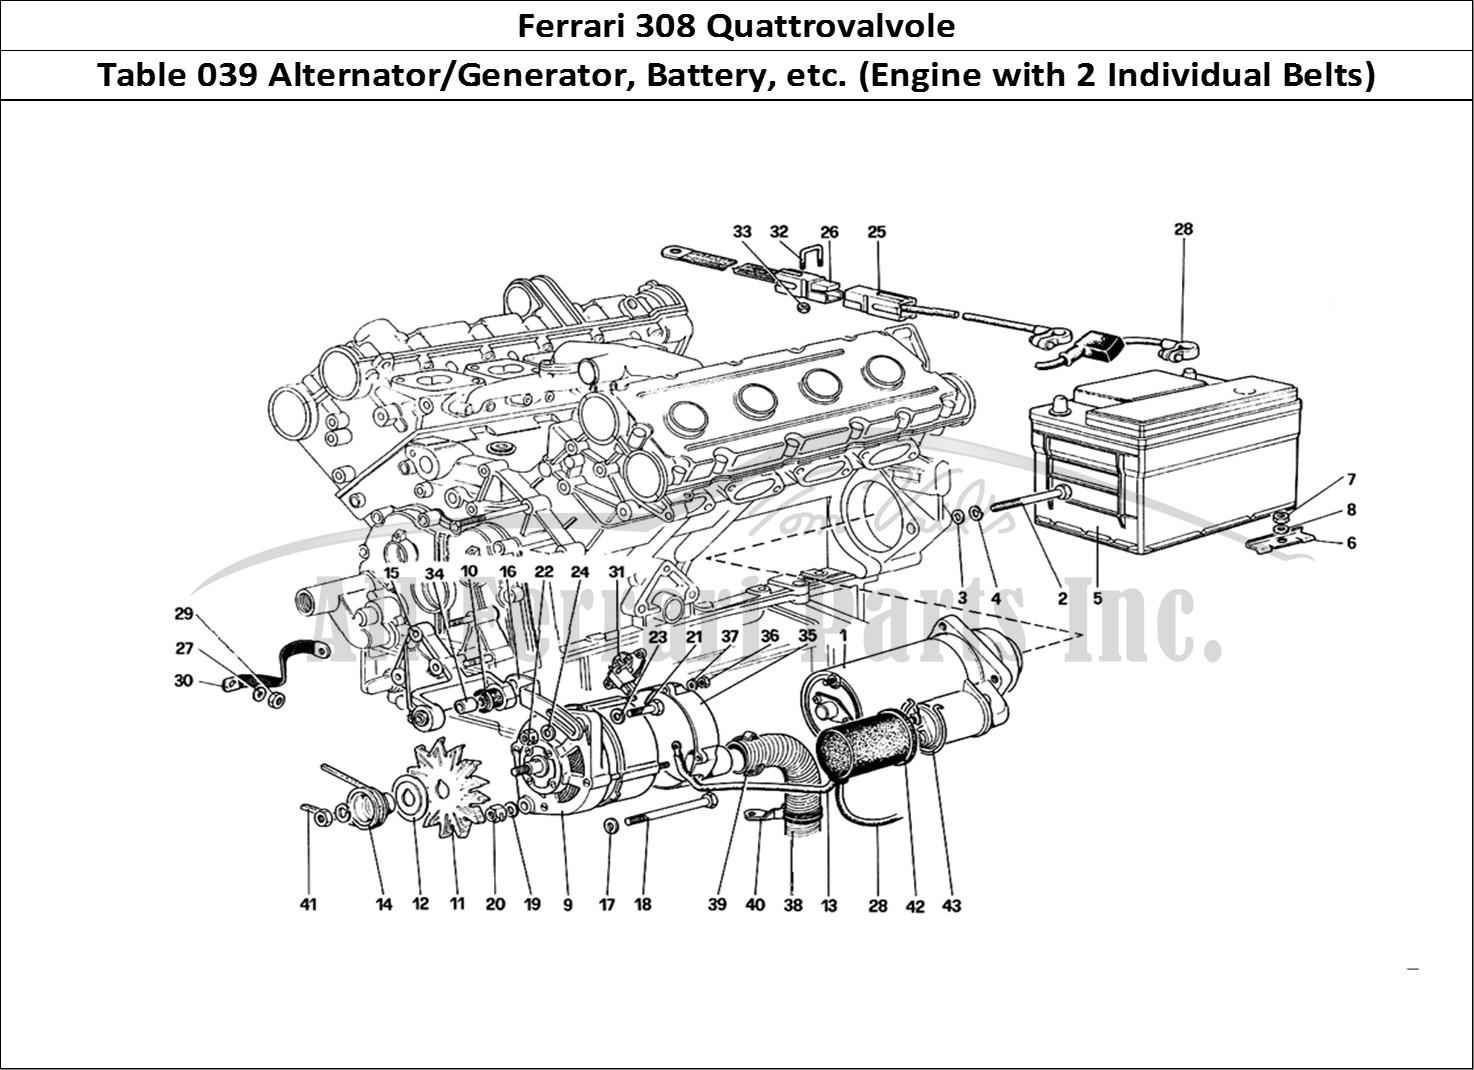 Buy Original Ferrari 308 Quattrovalvole 039 Alternator